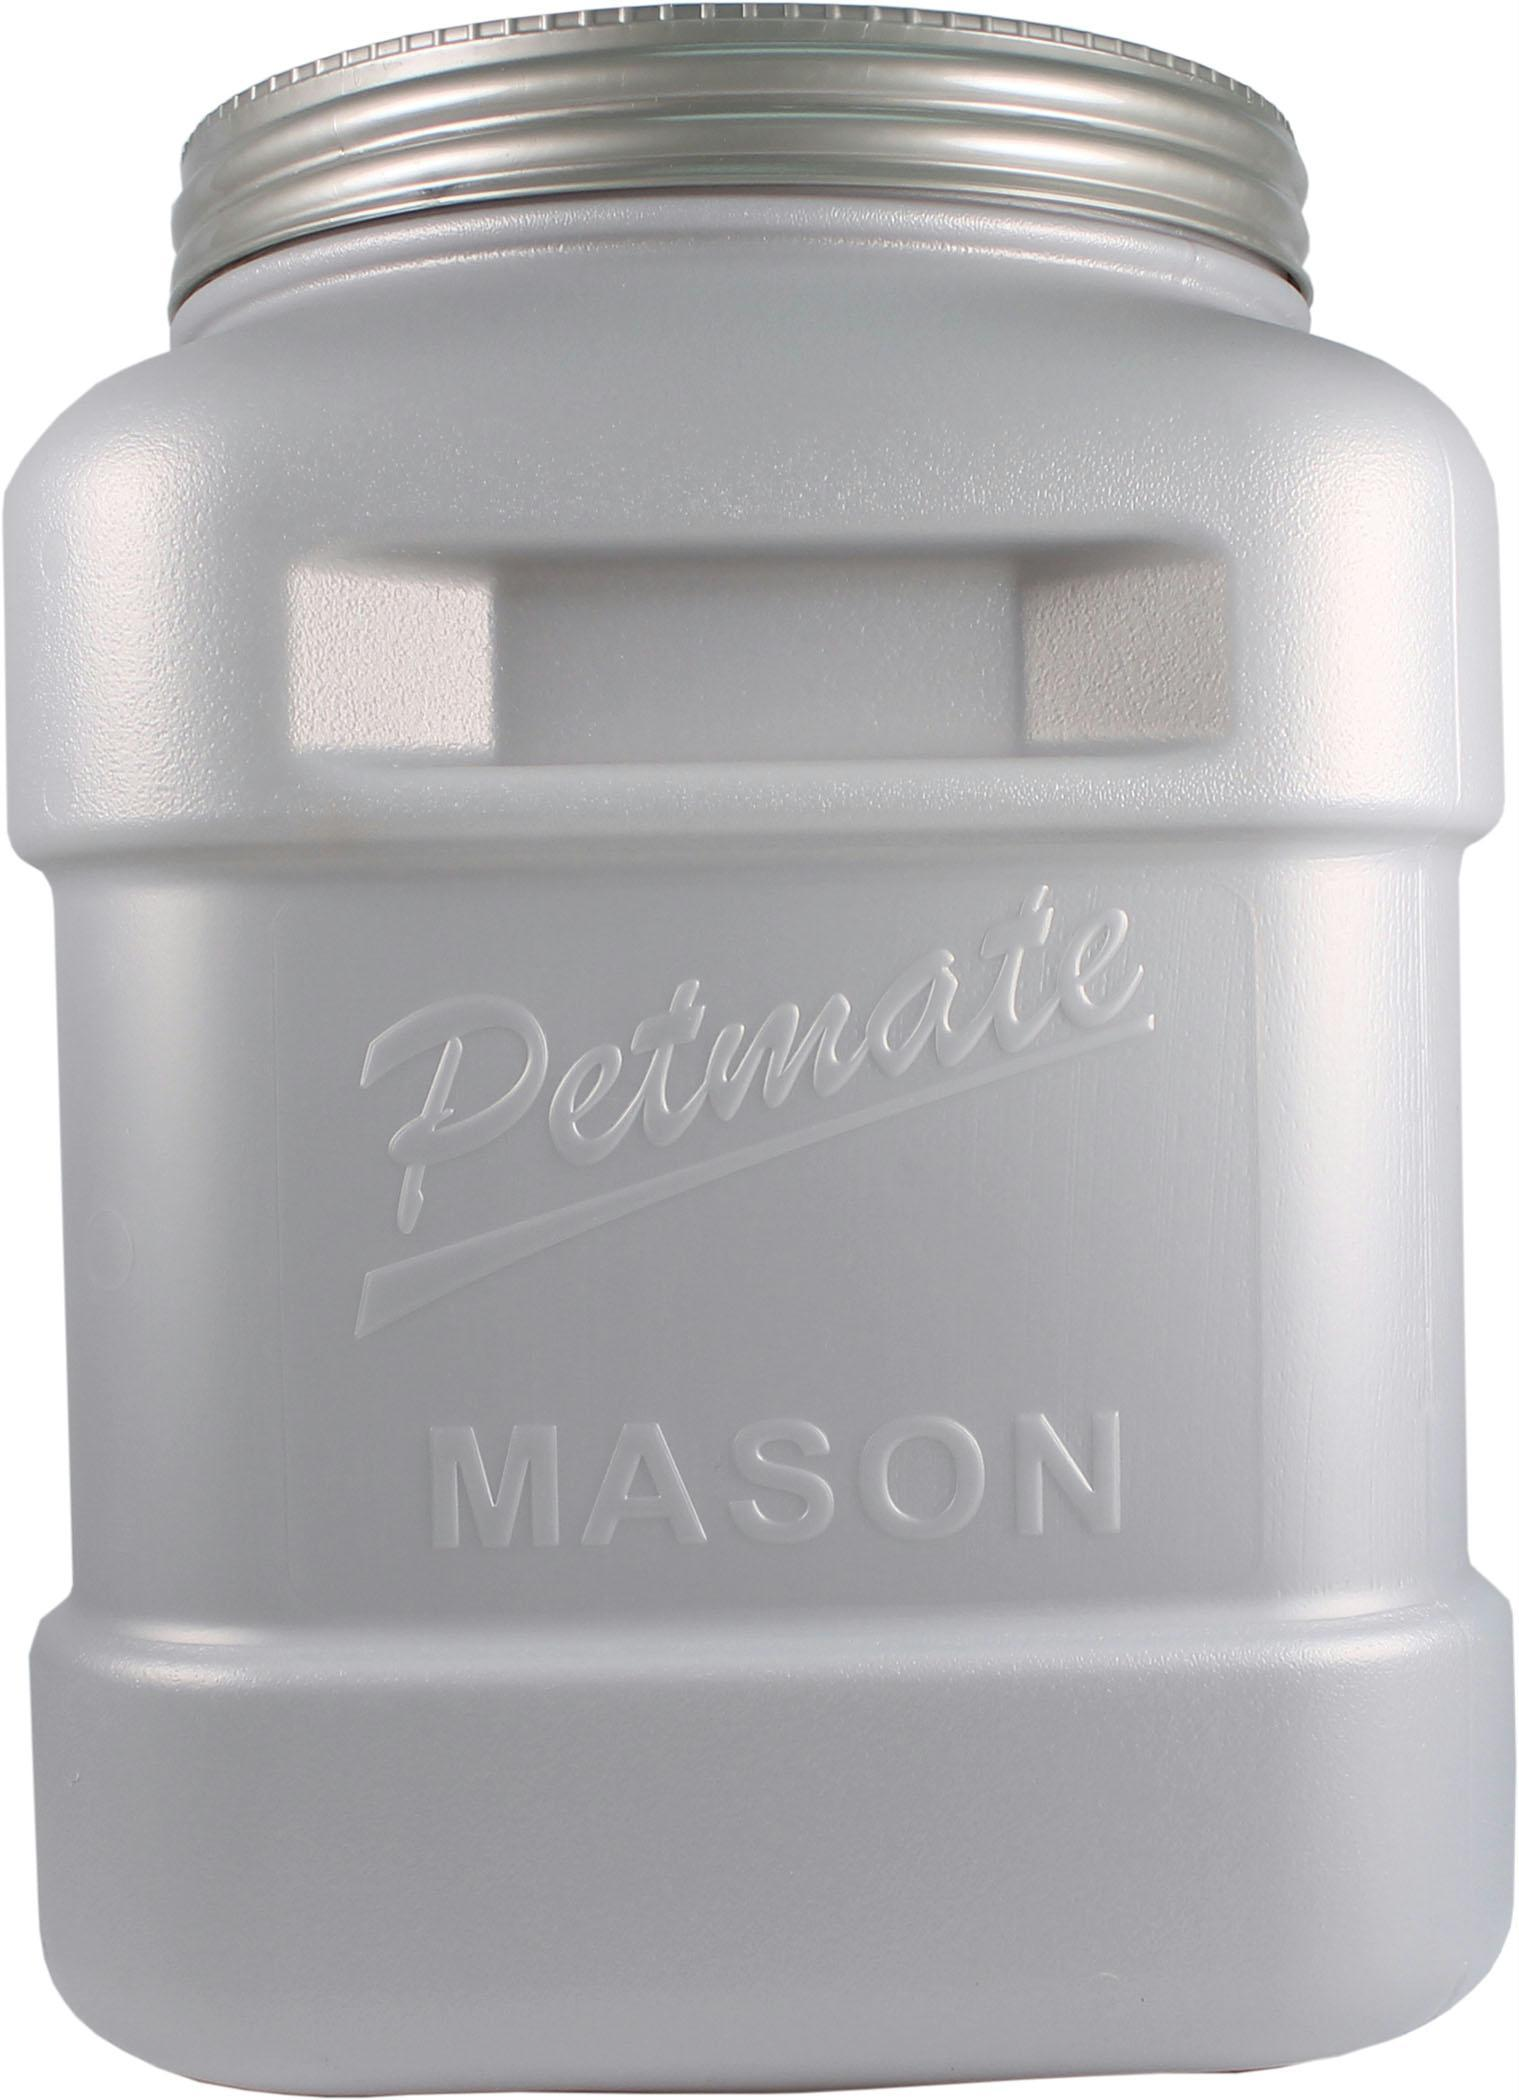 Mason Jar Pet Food Storage Container Pet Food Storage Container